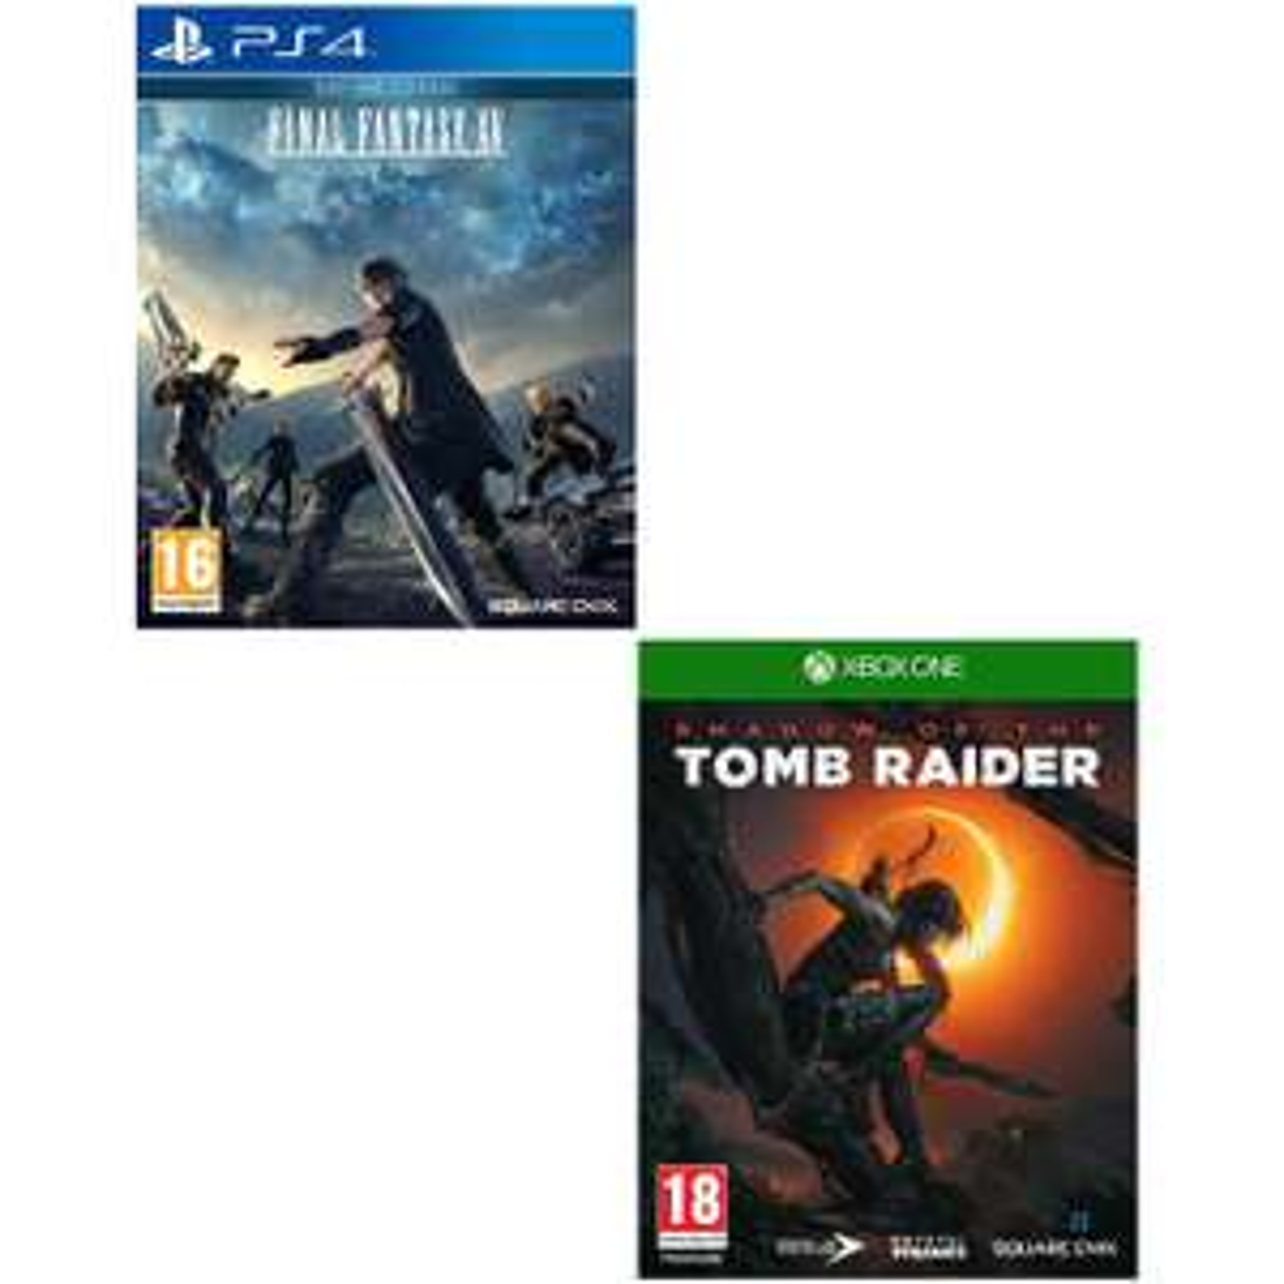 Final Fantasy XV - Day One Edition sur PS4 à 7,98€ ou Shadow of the Tomb Raider sur Xbox One à 9,60€ (Vendeur tiers)